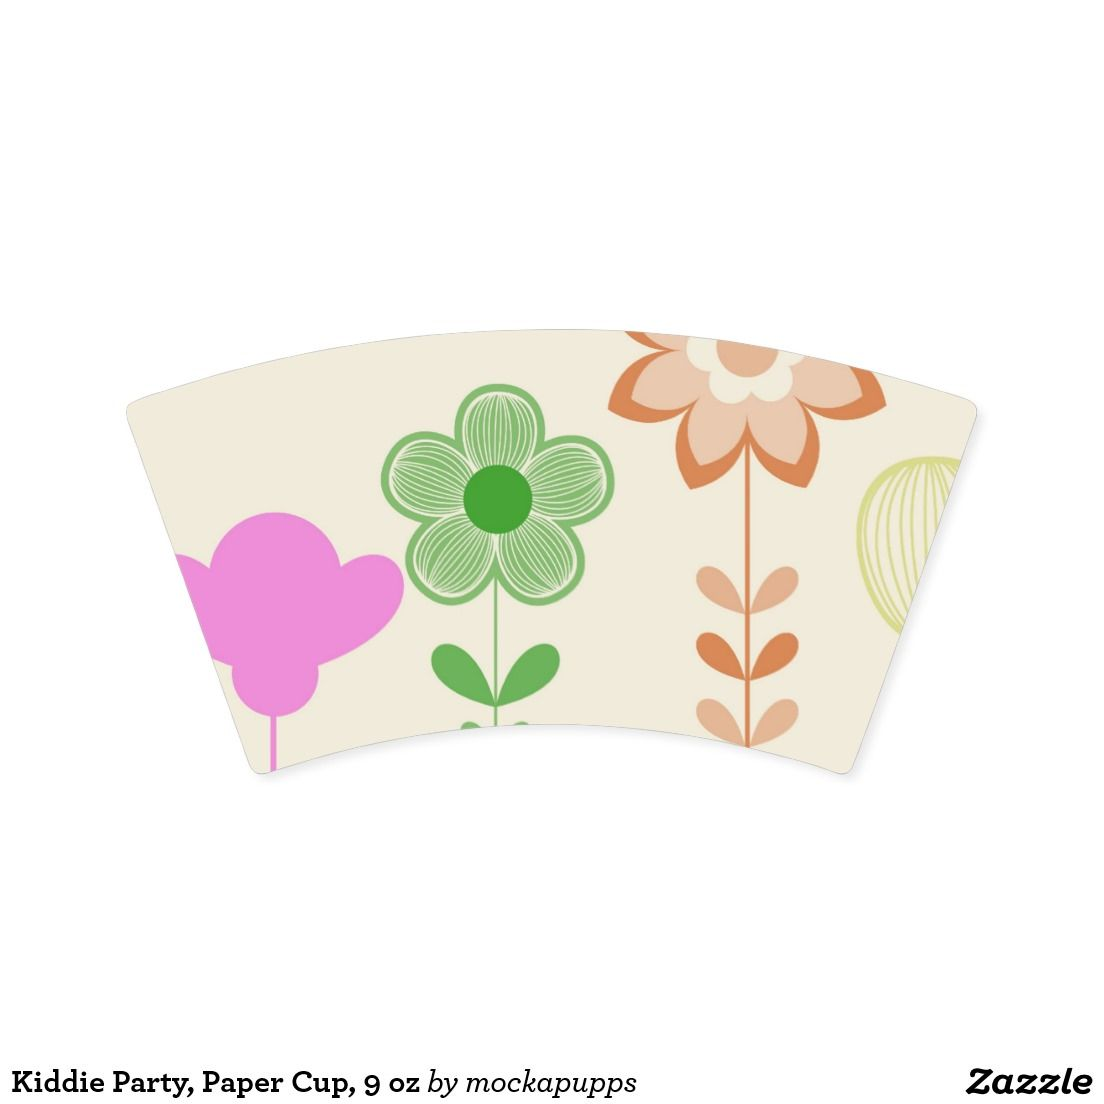 Kiddie Party, Paper Cup, 9 oz Paper Cup